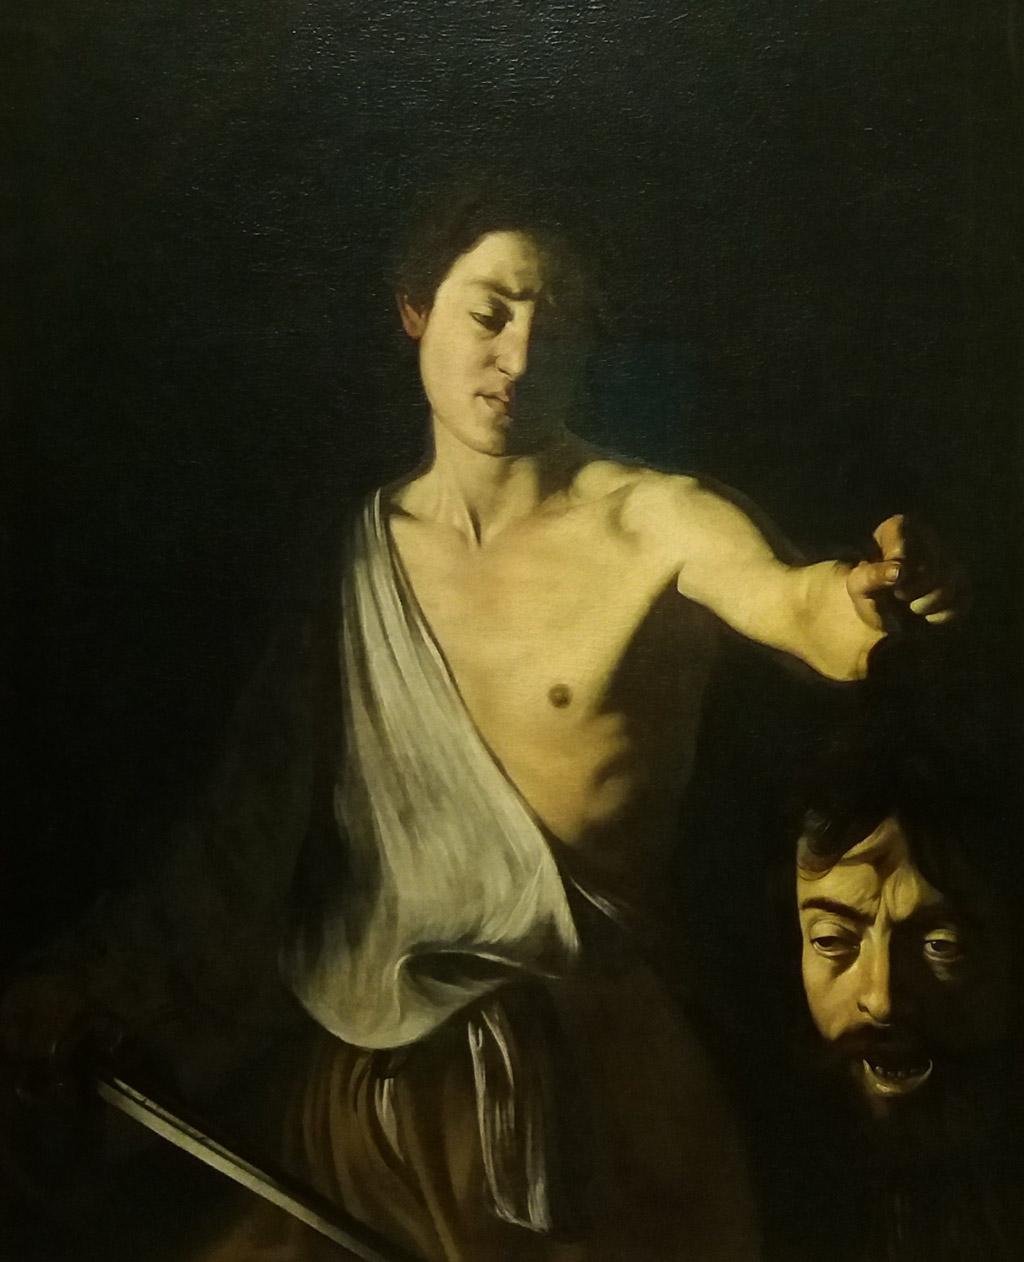 Караваджо. Давид и голова Голиафа